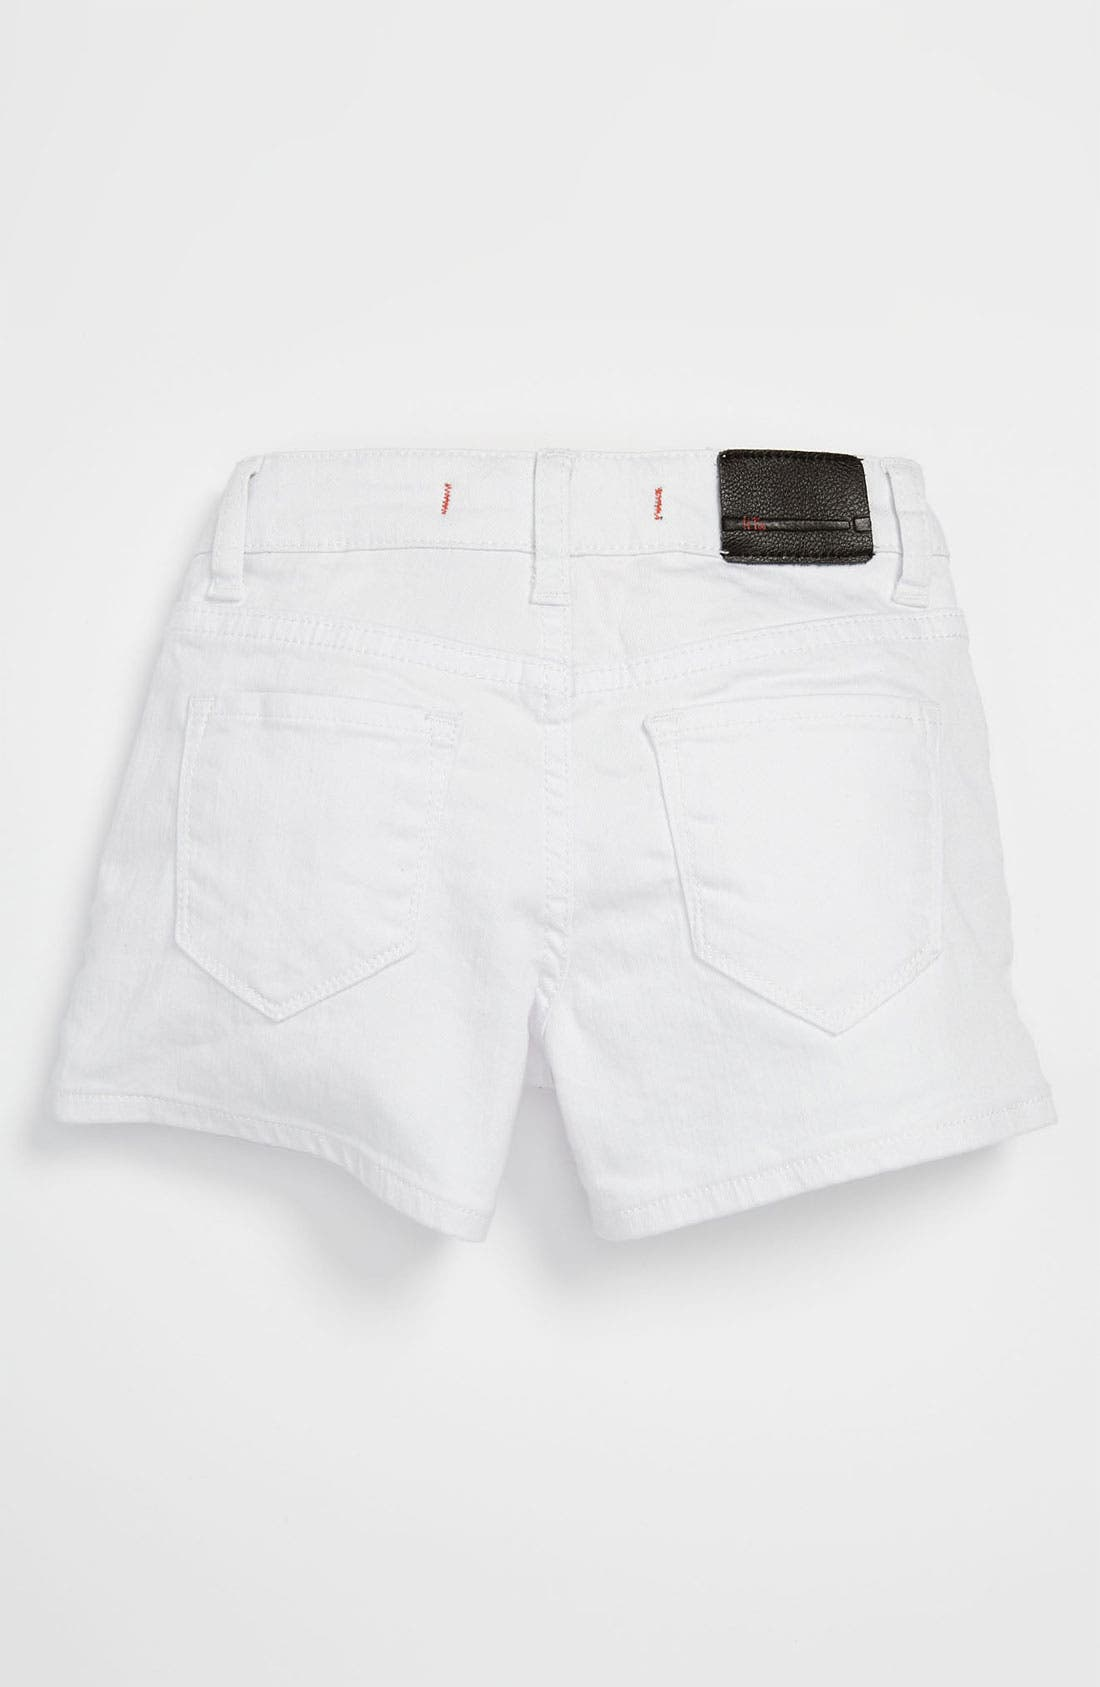 Alternate Image 1 Selected - !iT JEANS Denim Shorts (Big Girls)